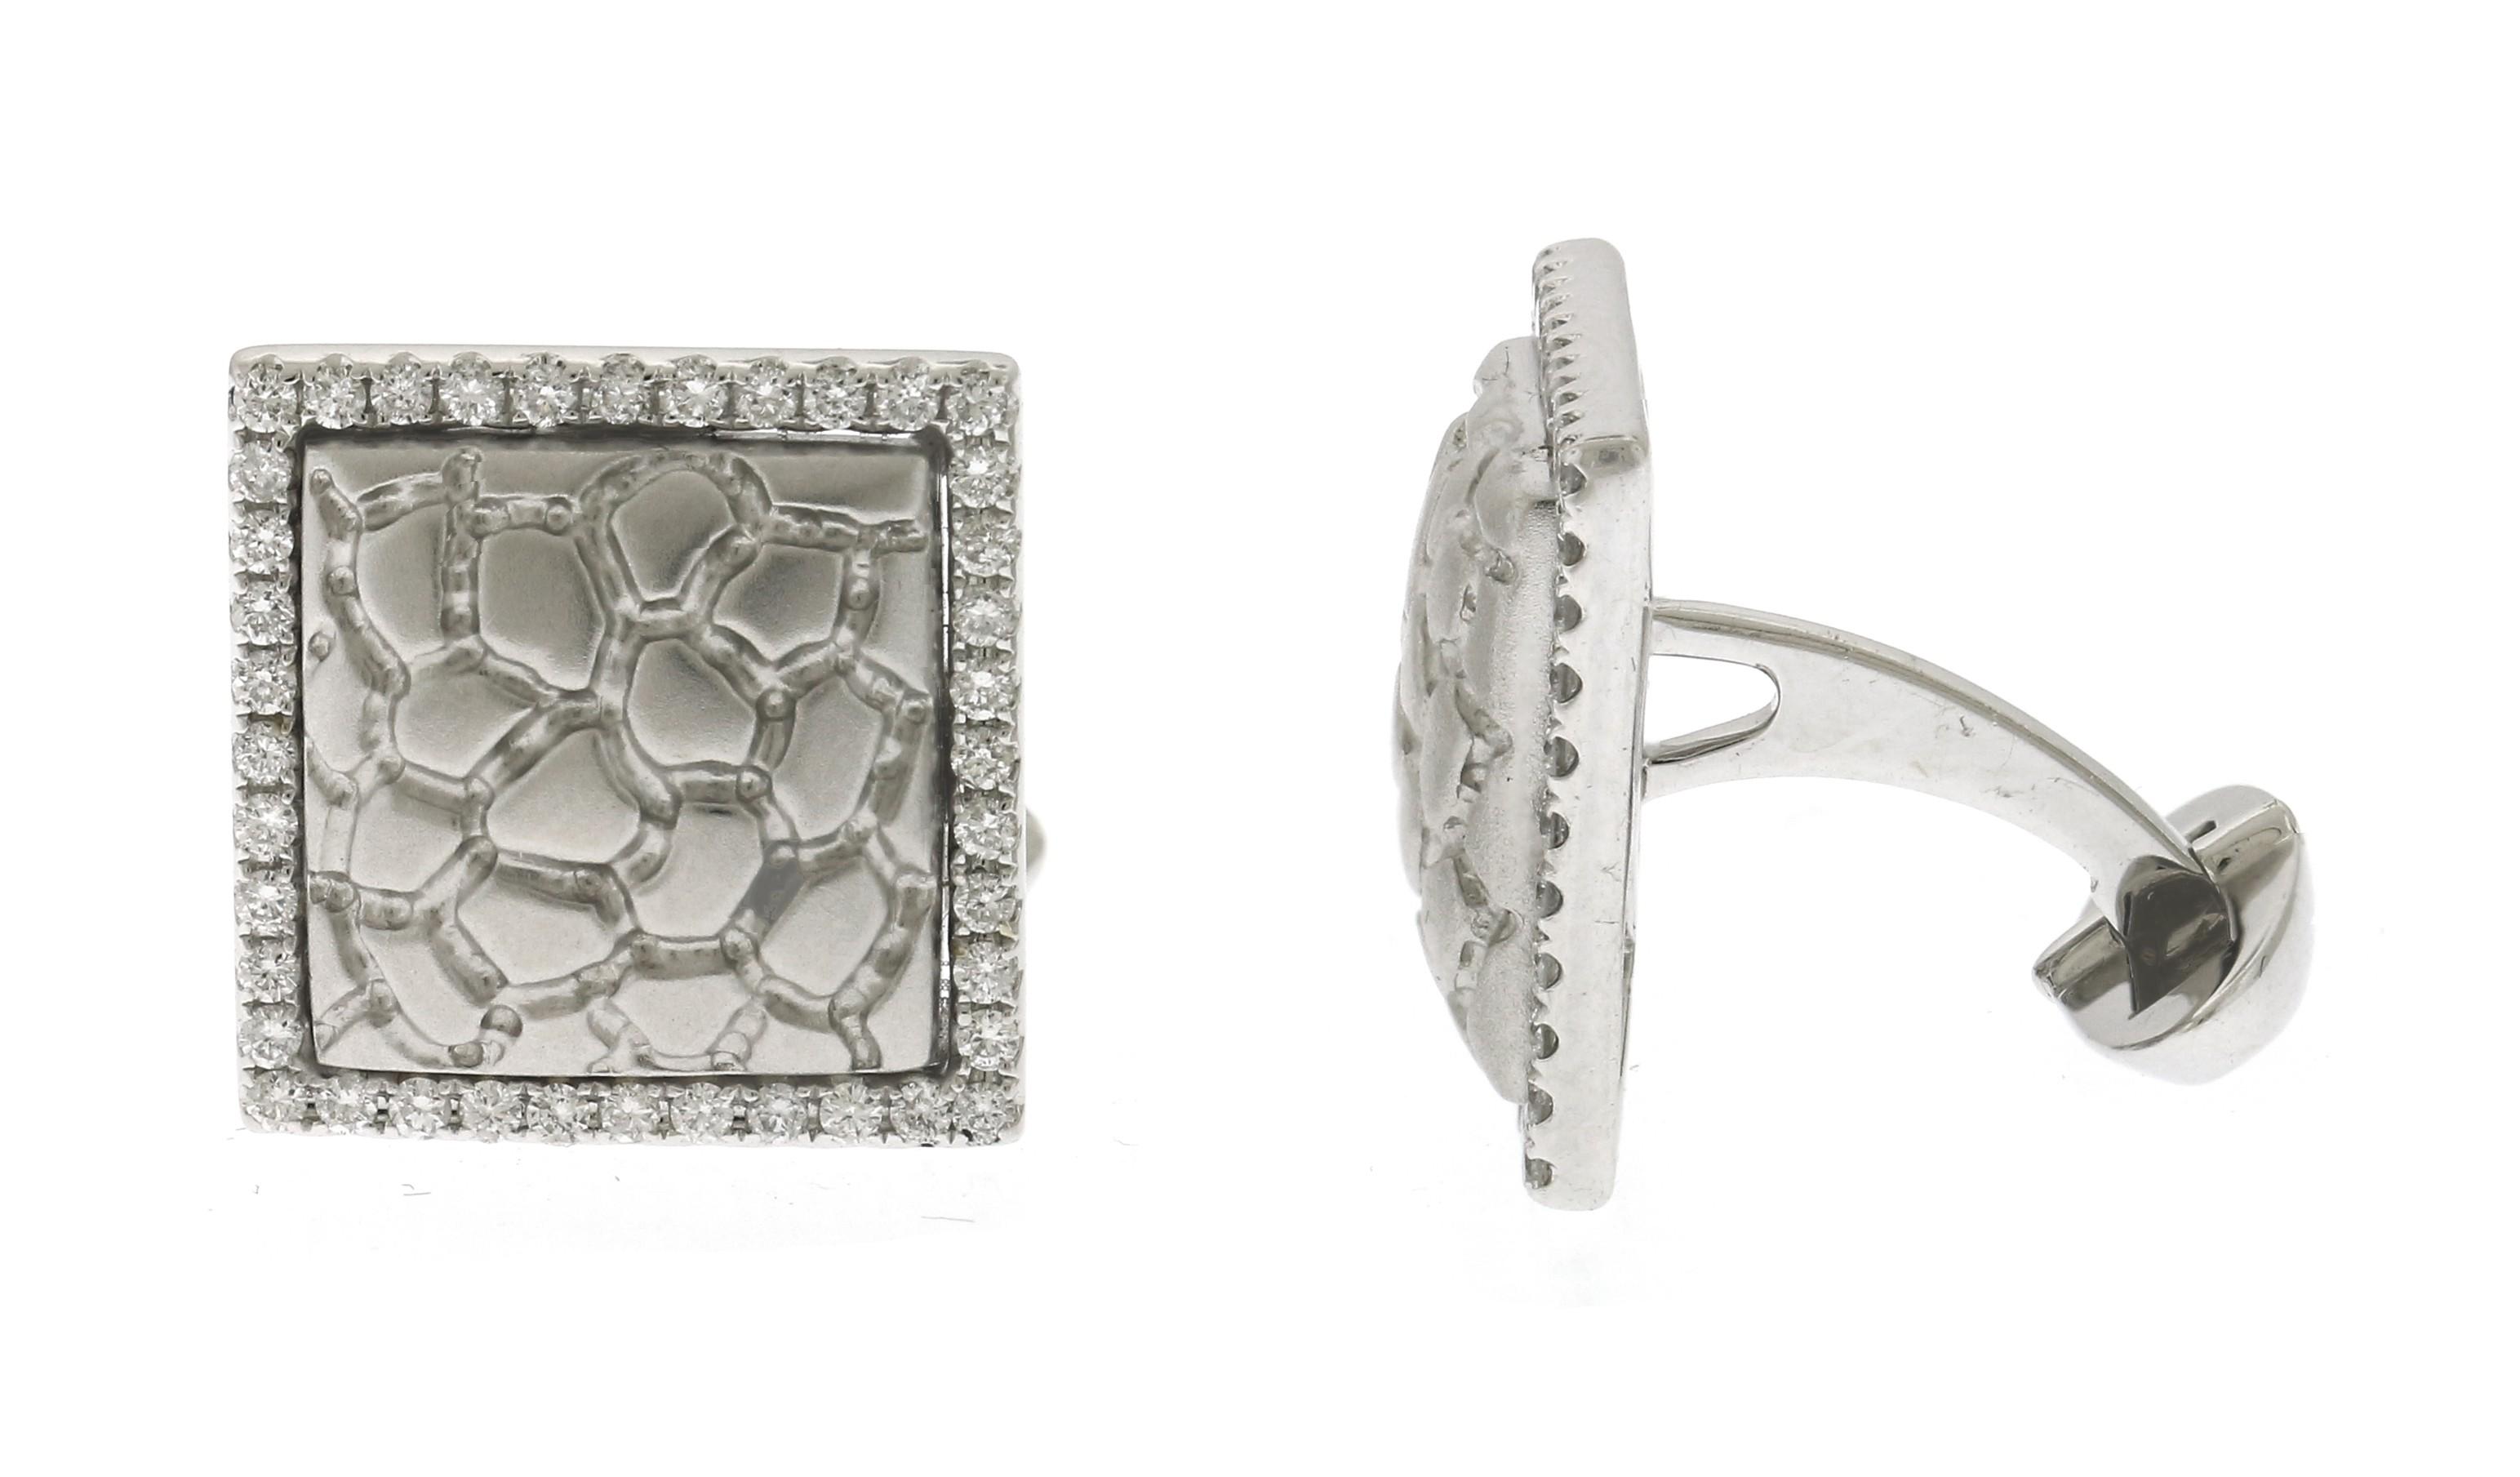 18kt White Gold Diamond Cuff Link